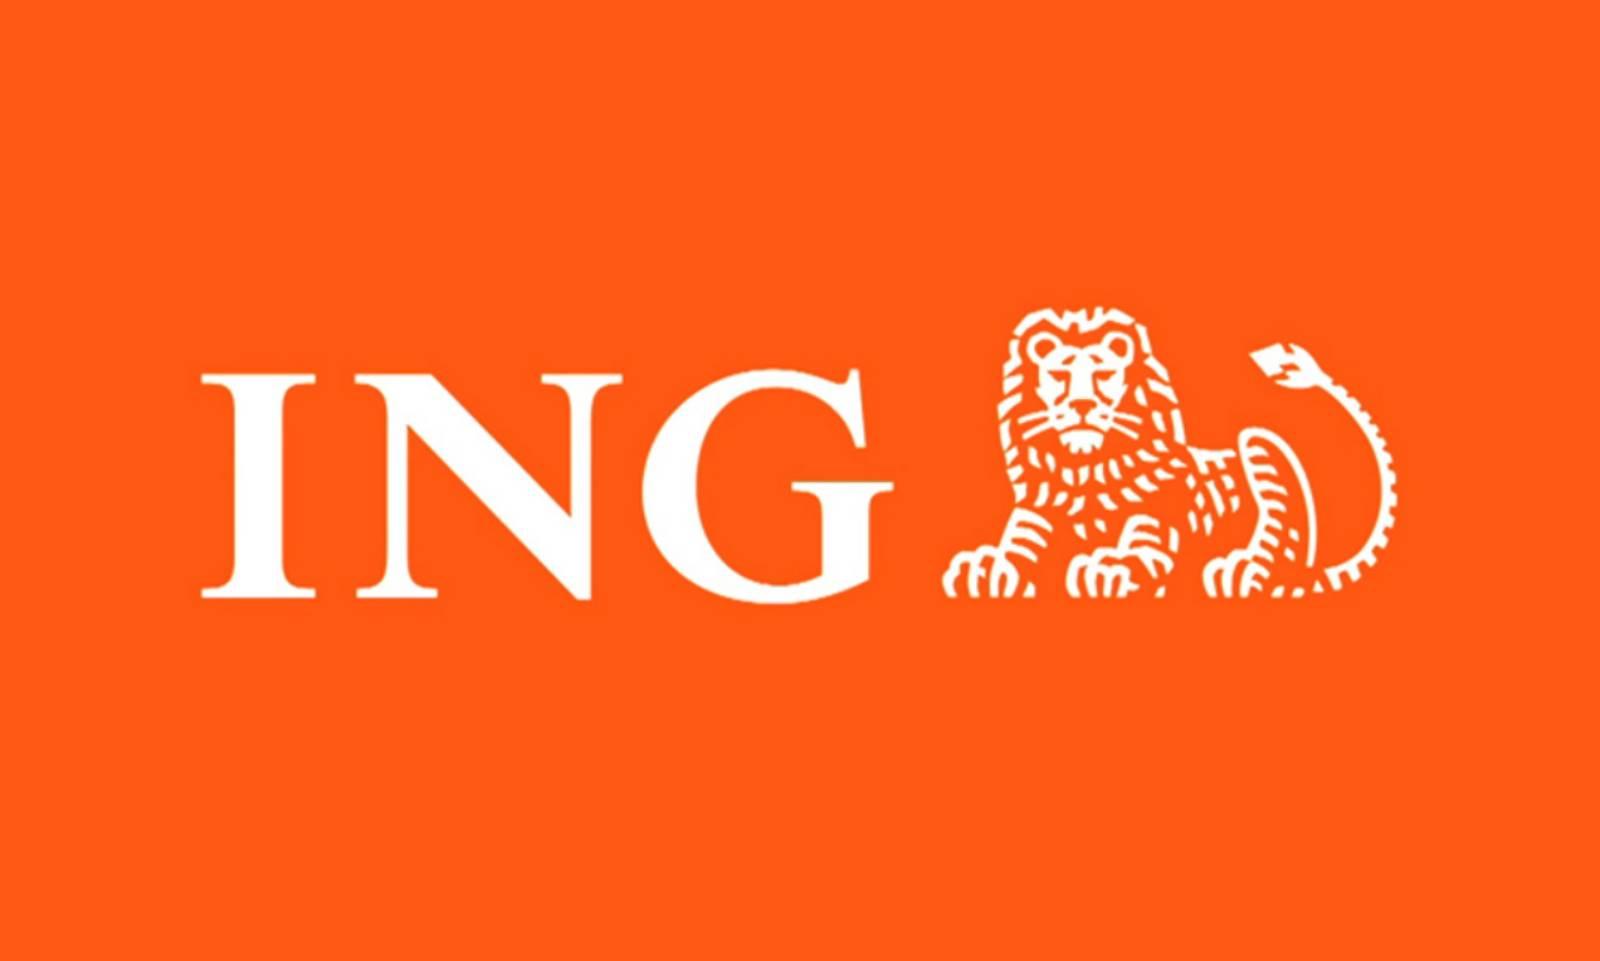 ING Bank rotunjire